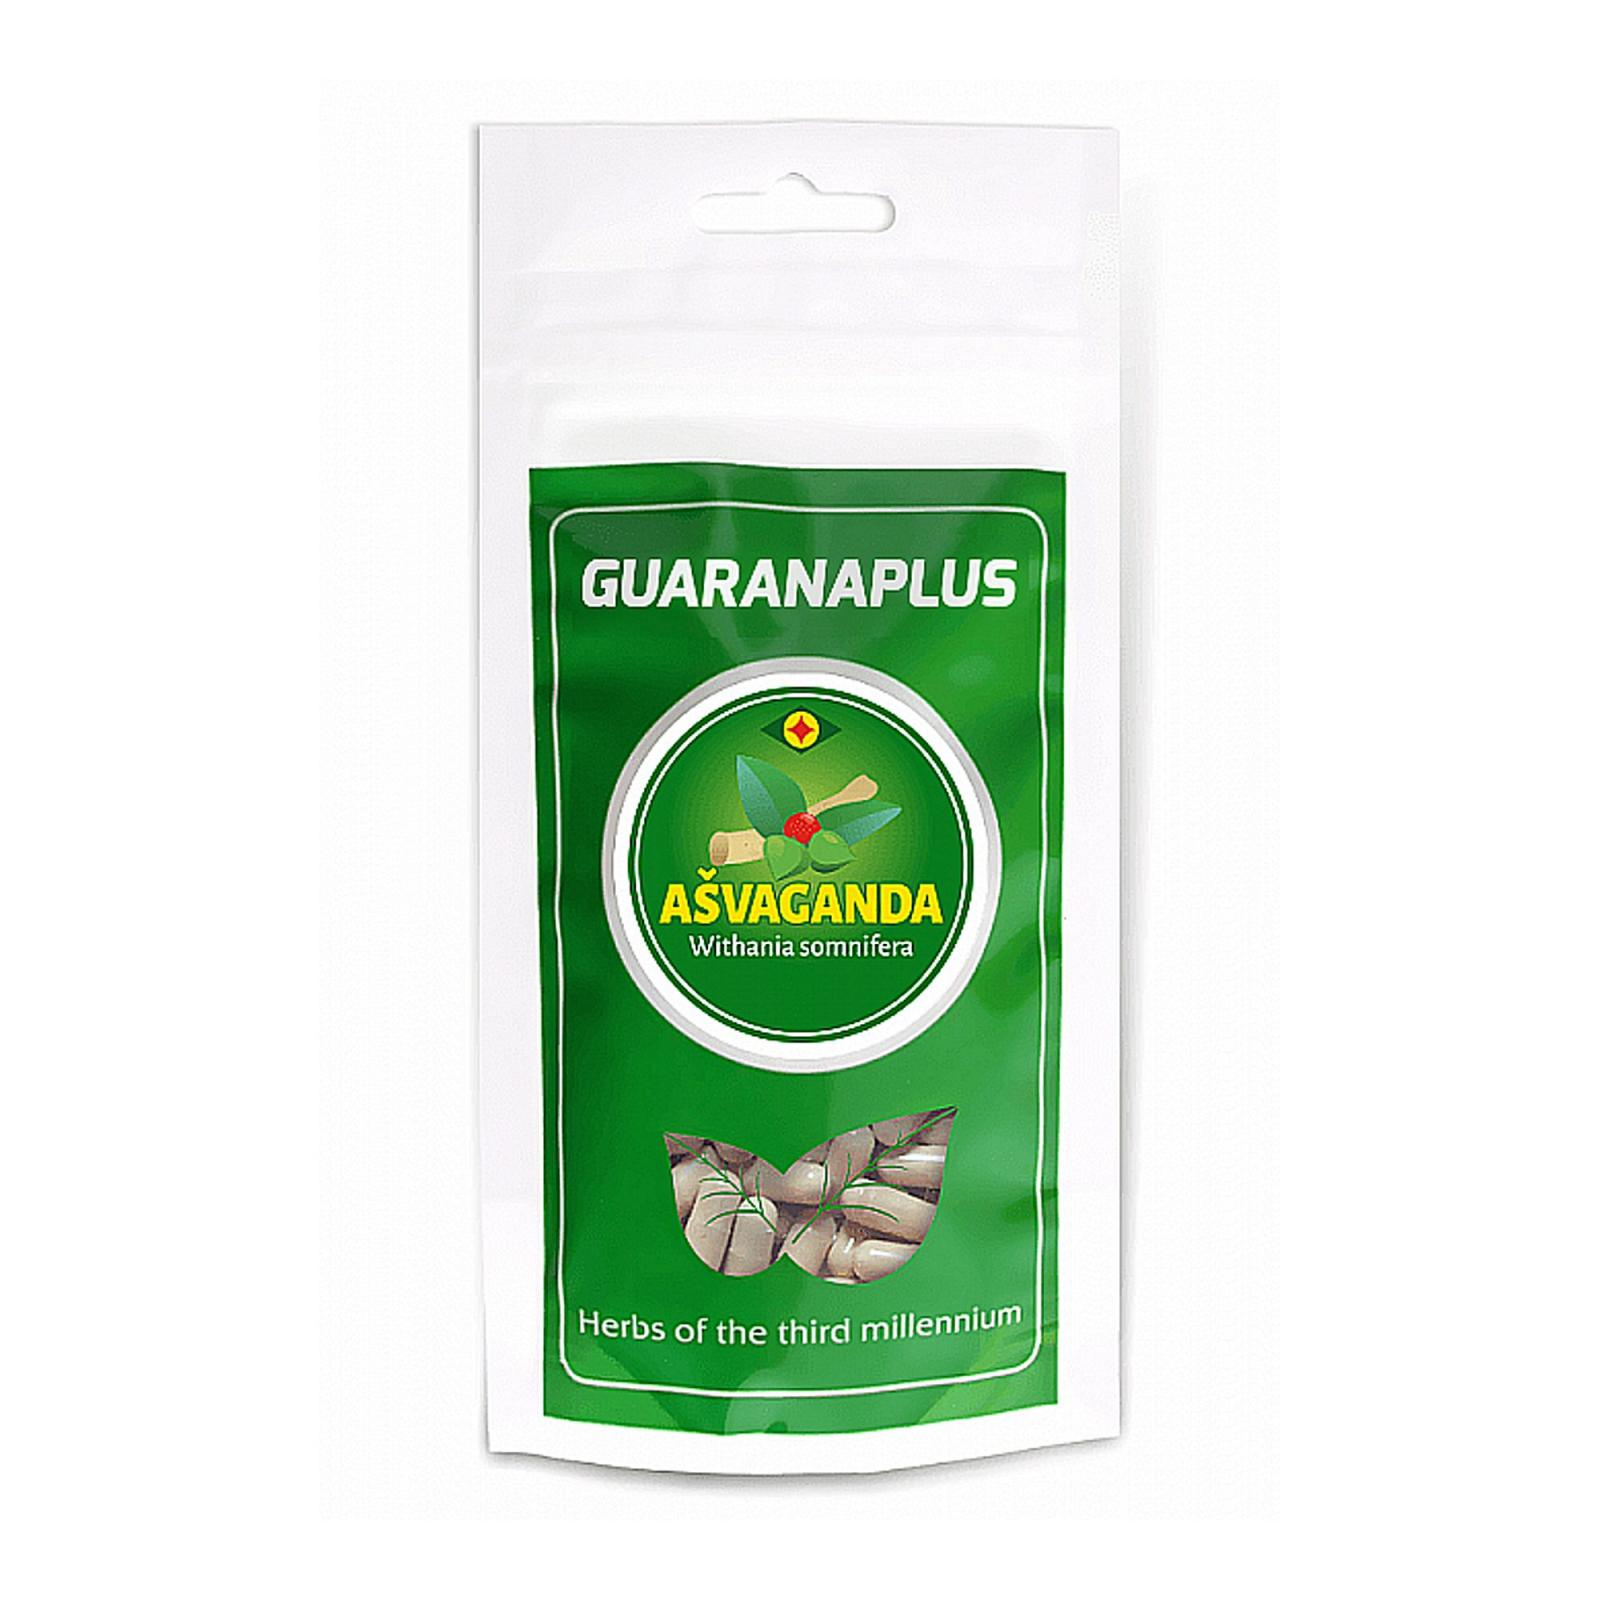 Guaranaplus Ašvaganda, kapsle 100 ks